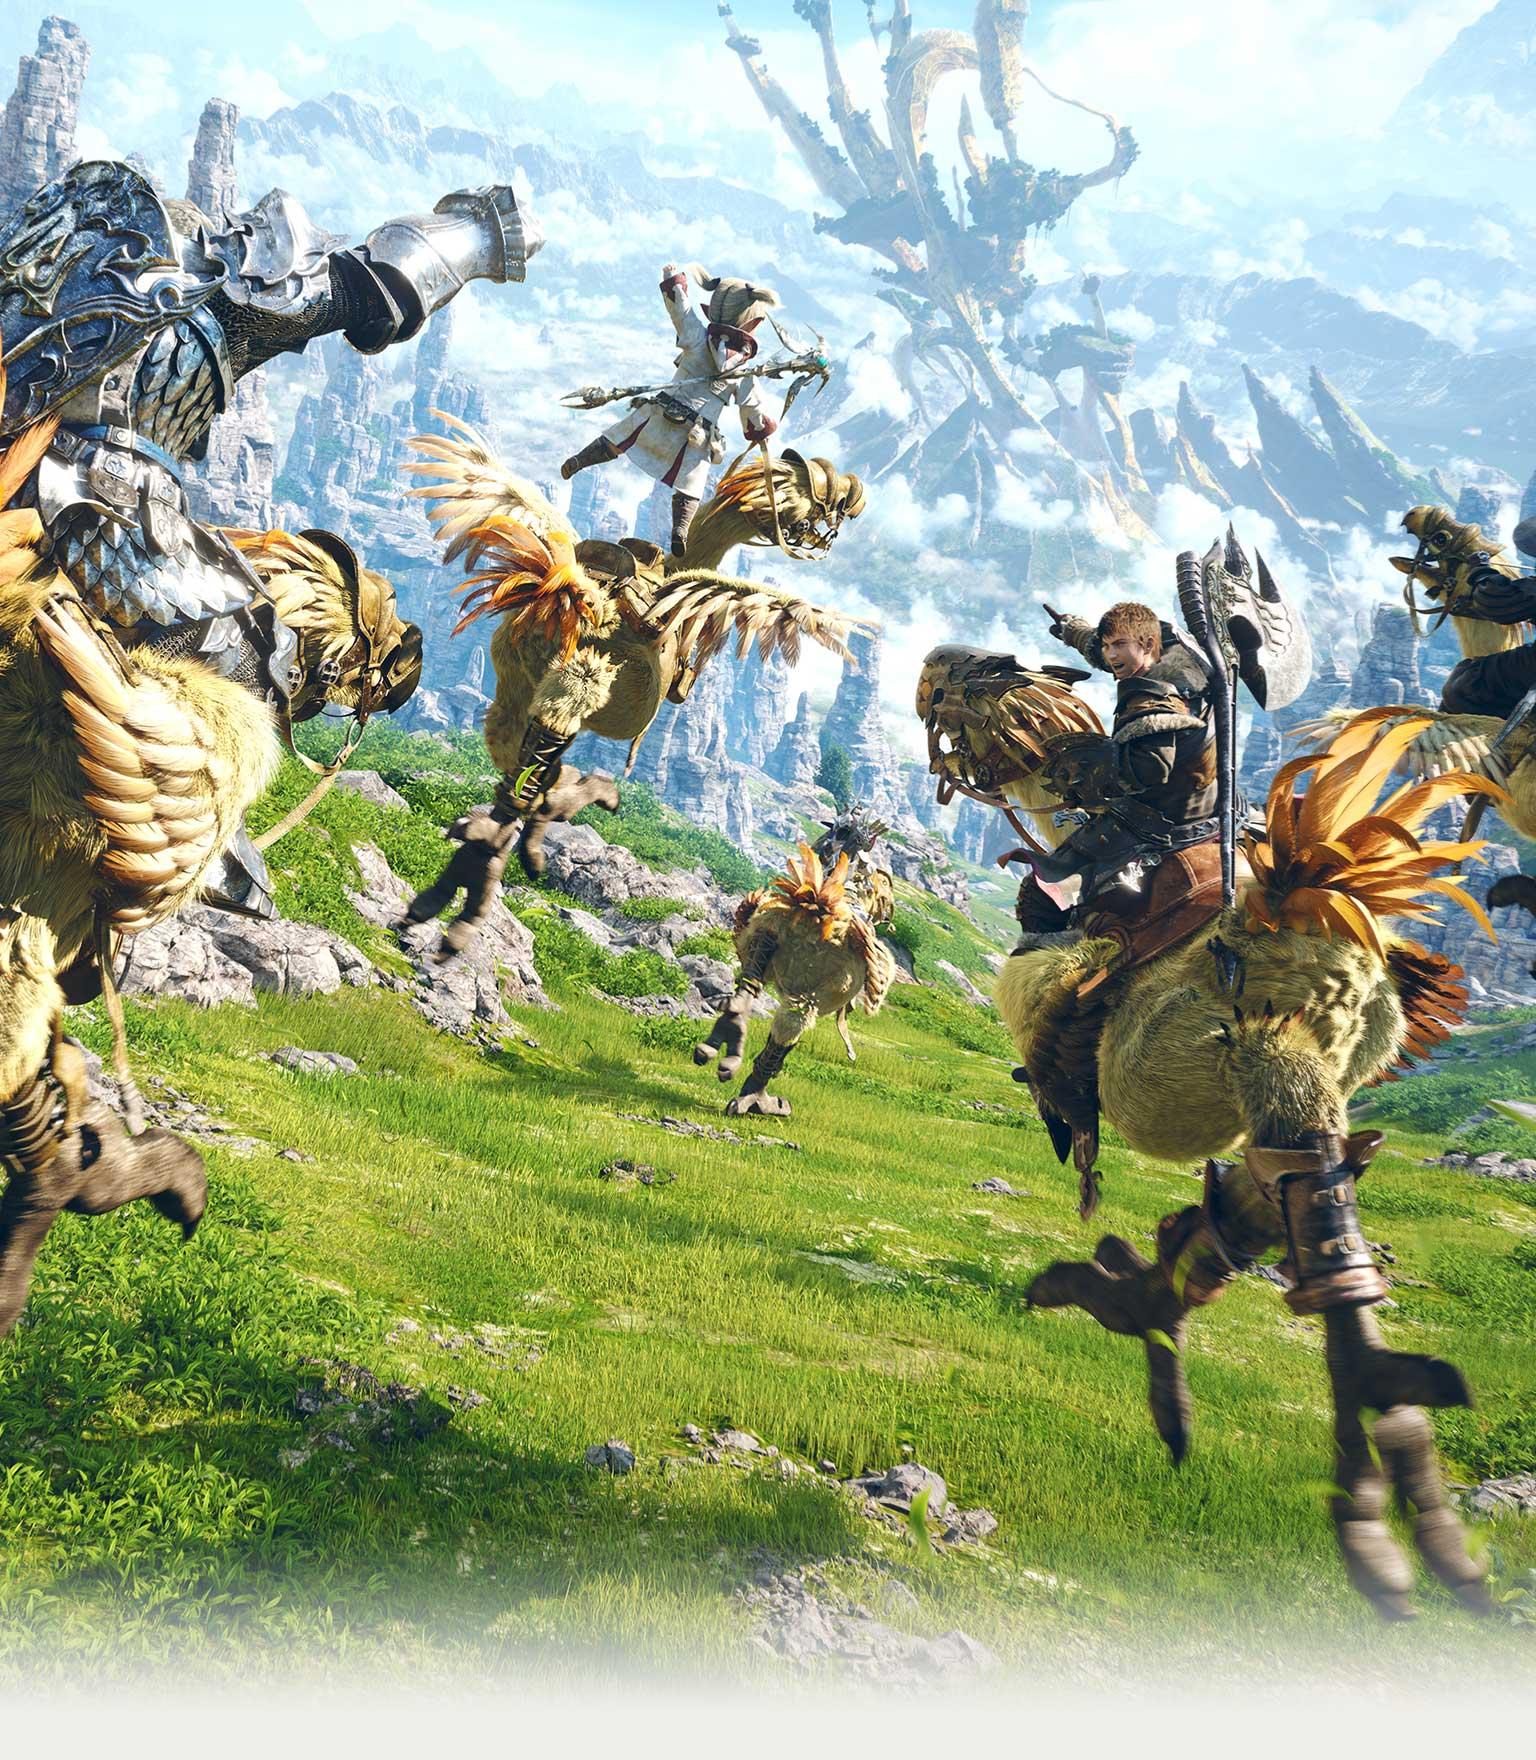 Final Fantasy Xiv Promotional Site